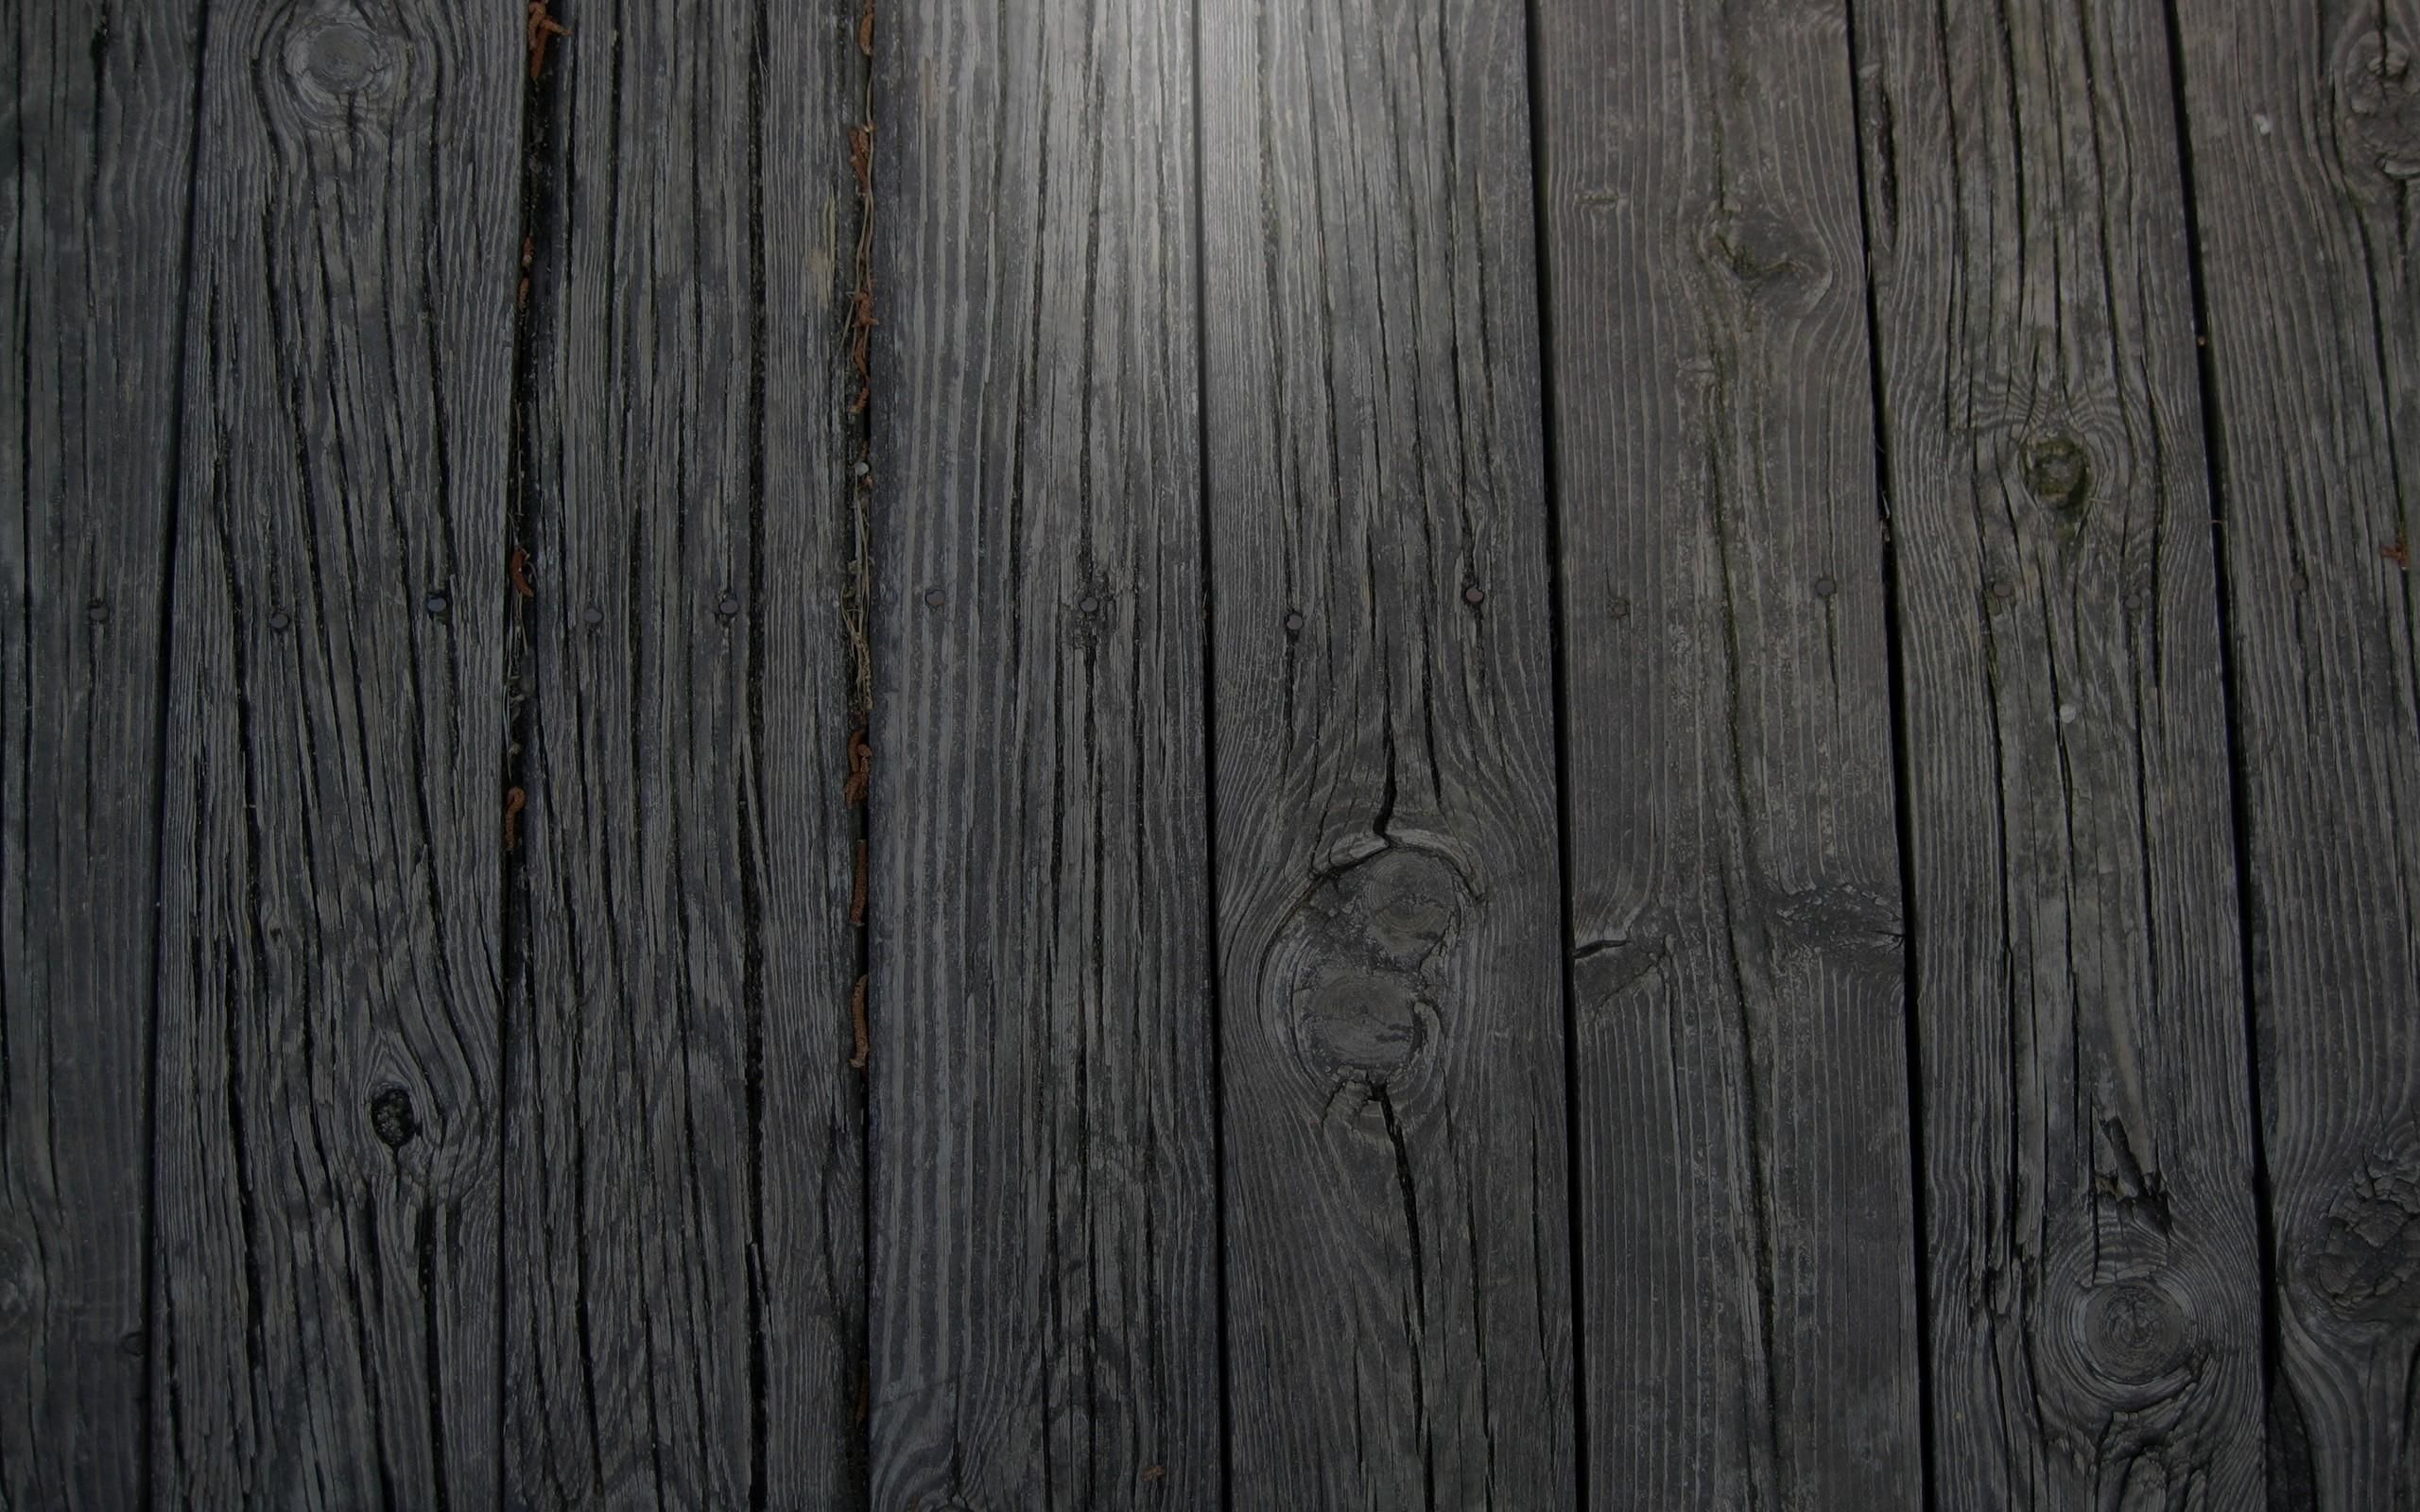 Wood HD Wallpapers Backgrounds Wallpaper Kayu, Seni